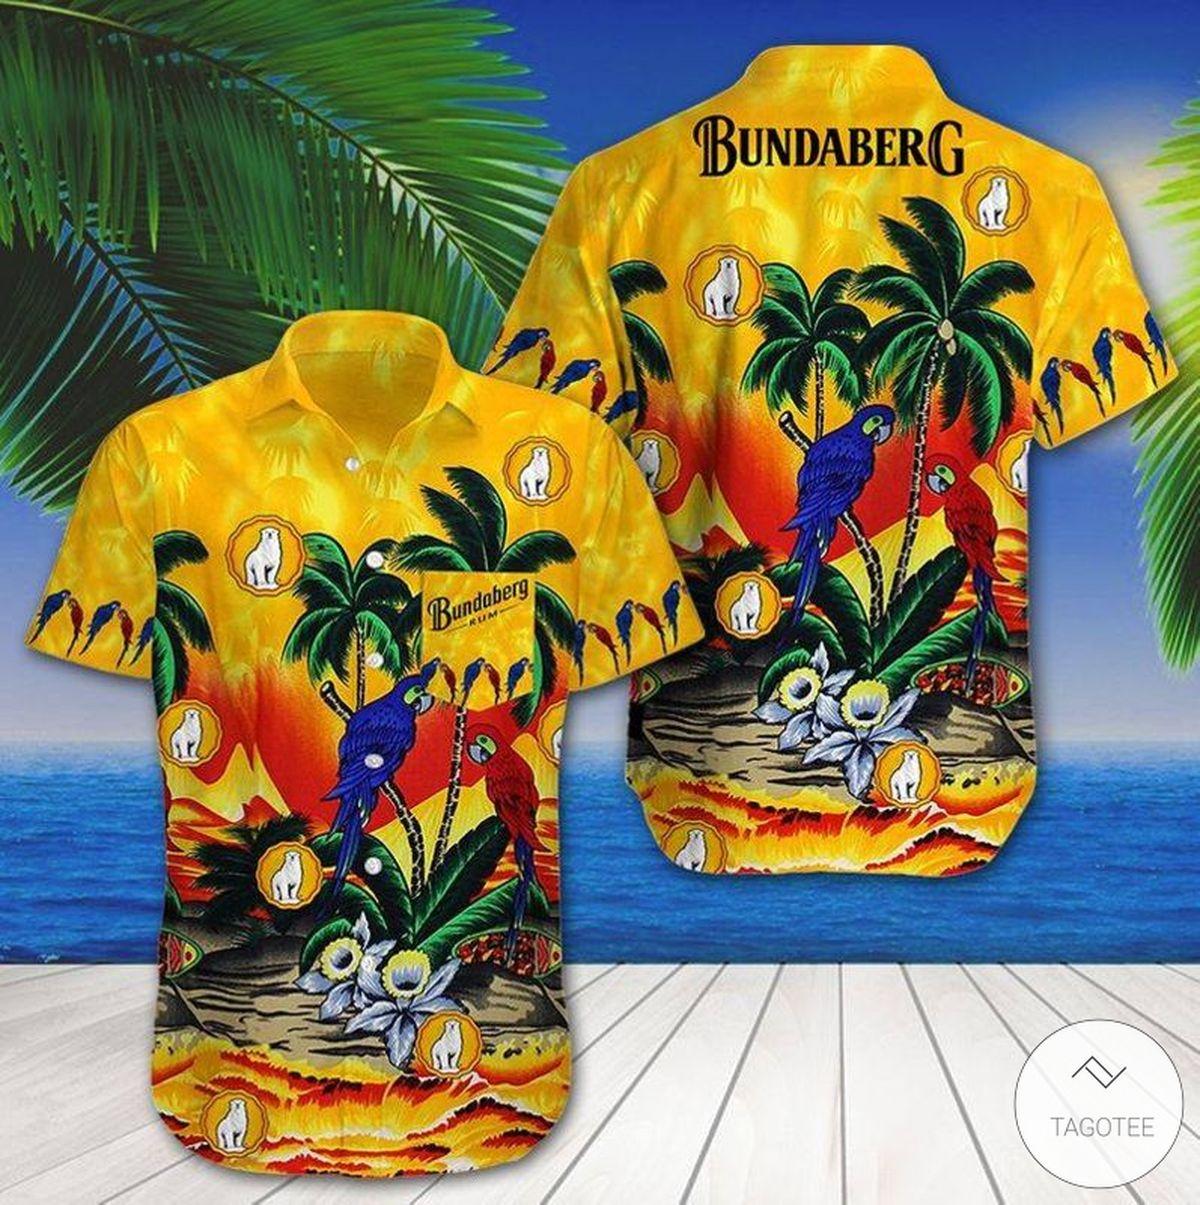 Bundaberg Brewed Drinks Hawaiian Shirt